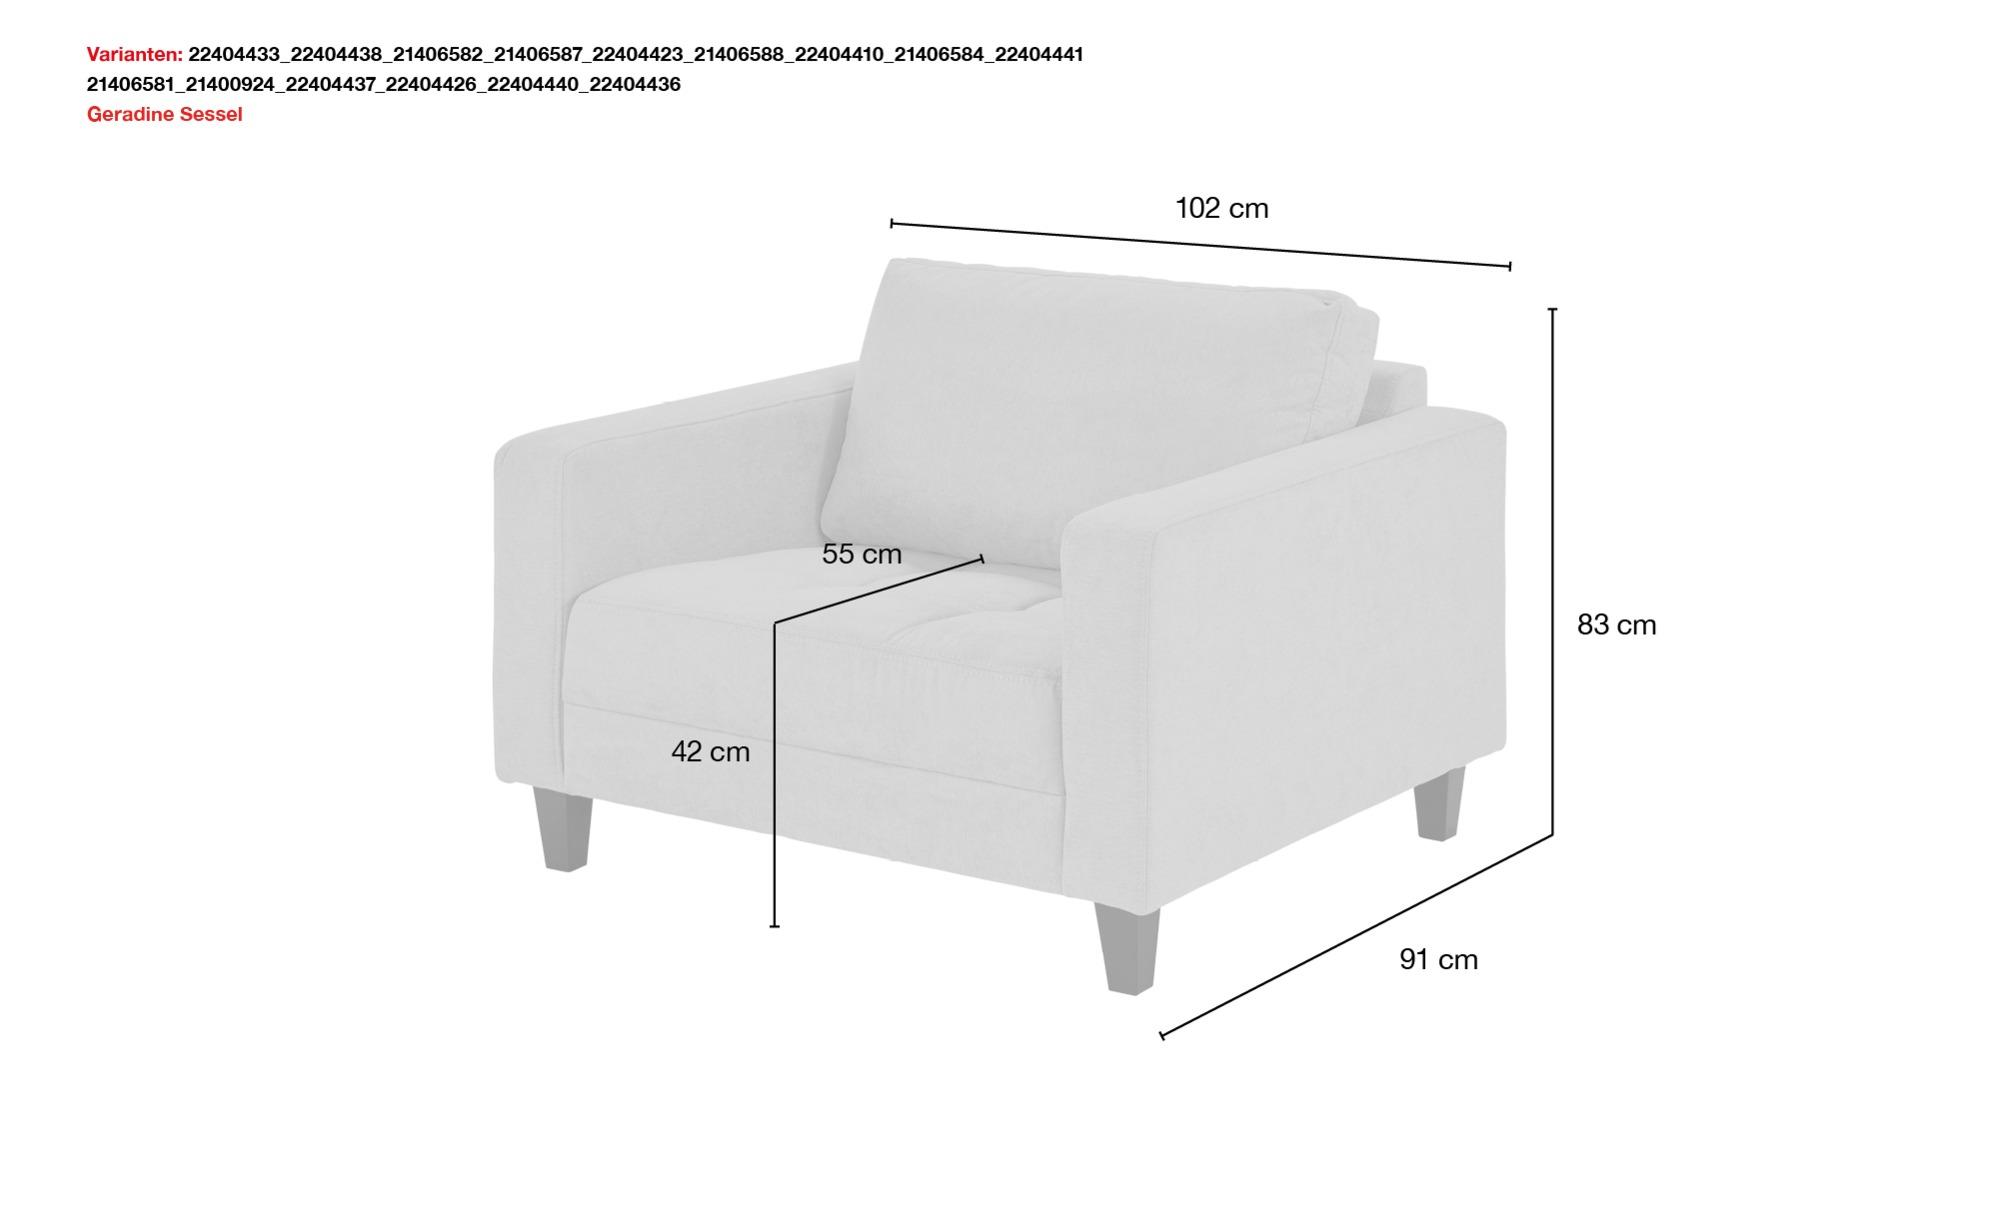 smart Sessel grün - Stoff Geradine ¦ grün ¦ Maße (cm): B: 91 H: 93 T: 92 Polstermöbel > Sessel > Polstersessel - Höffner